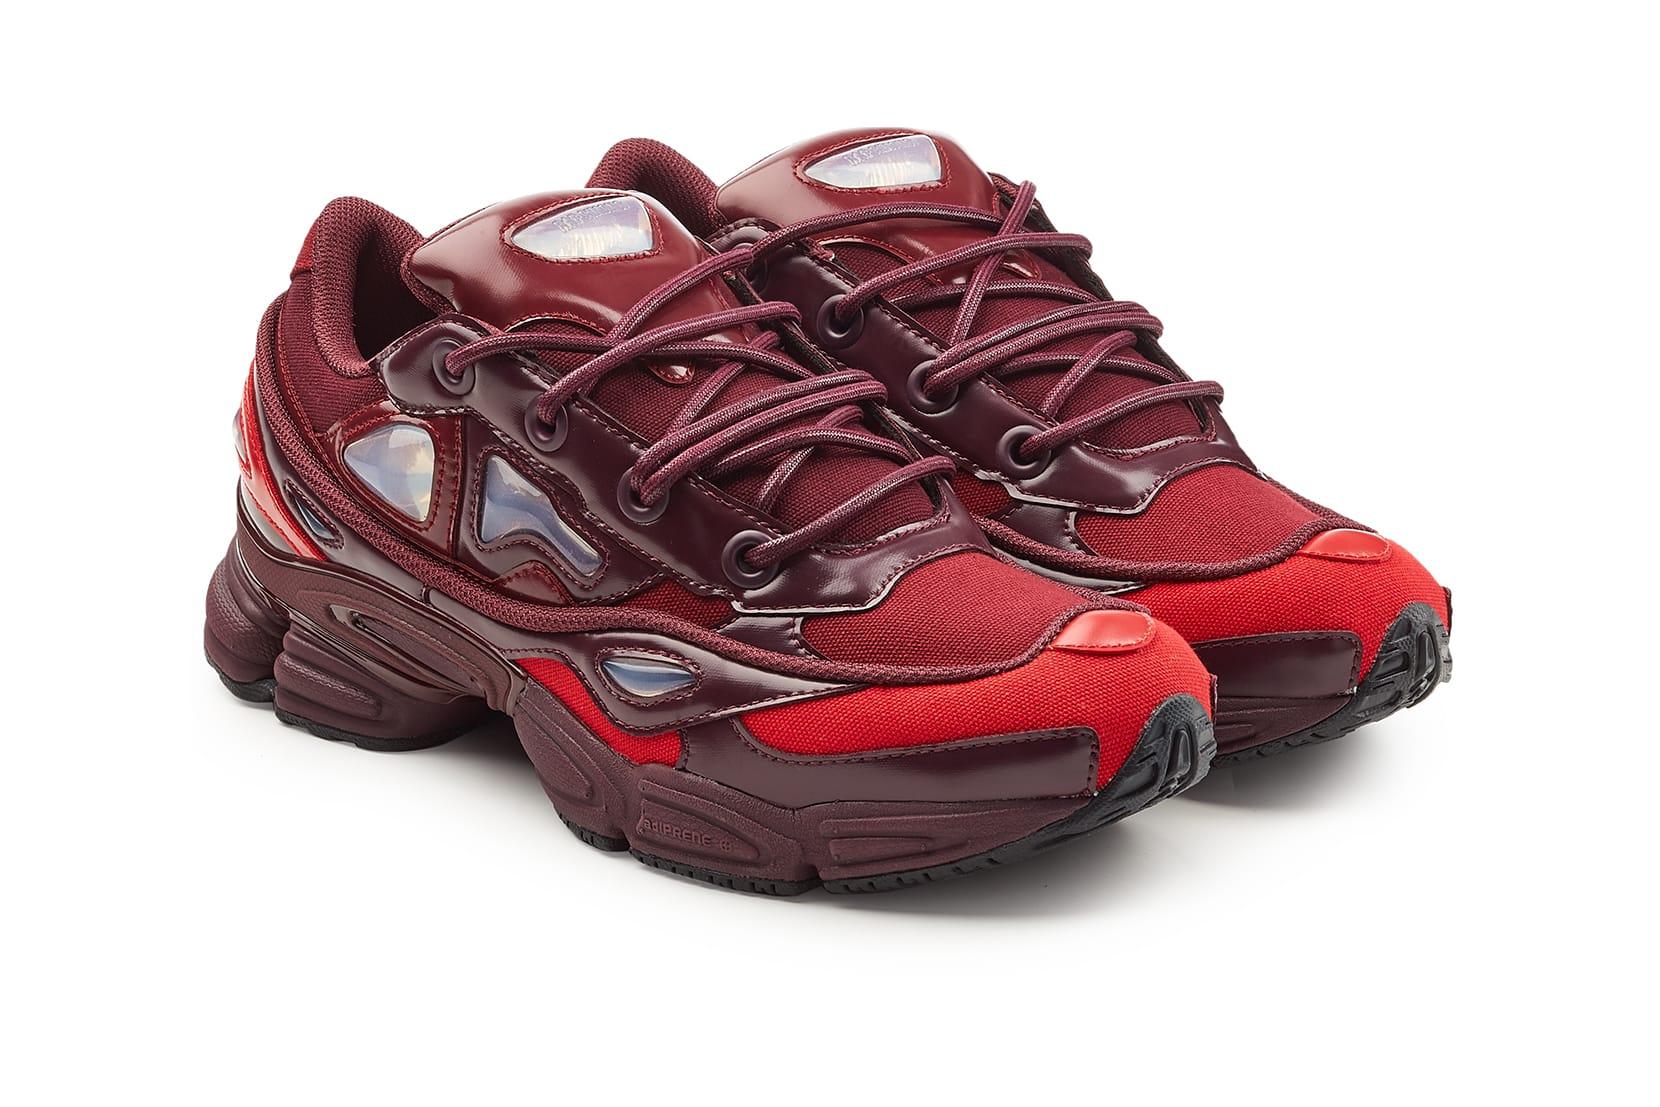 adidas by Raf Simons Ozweego III New